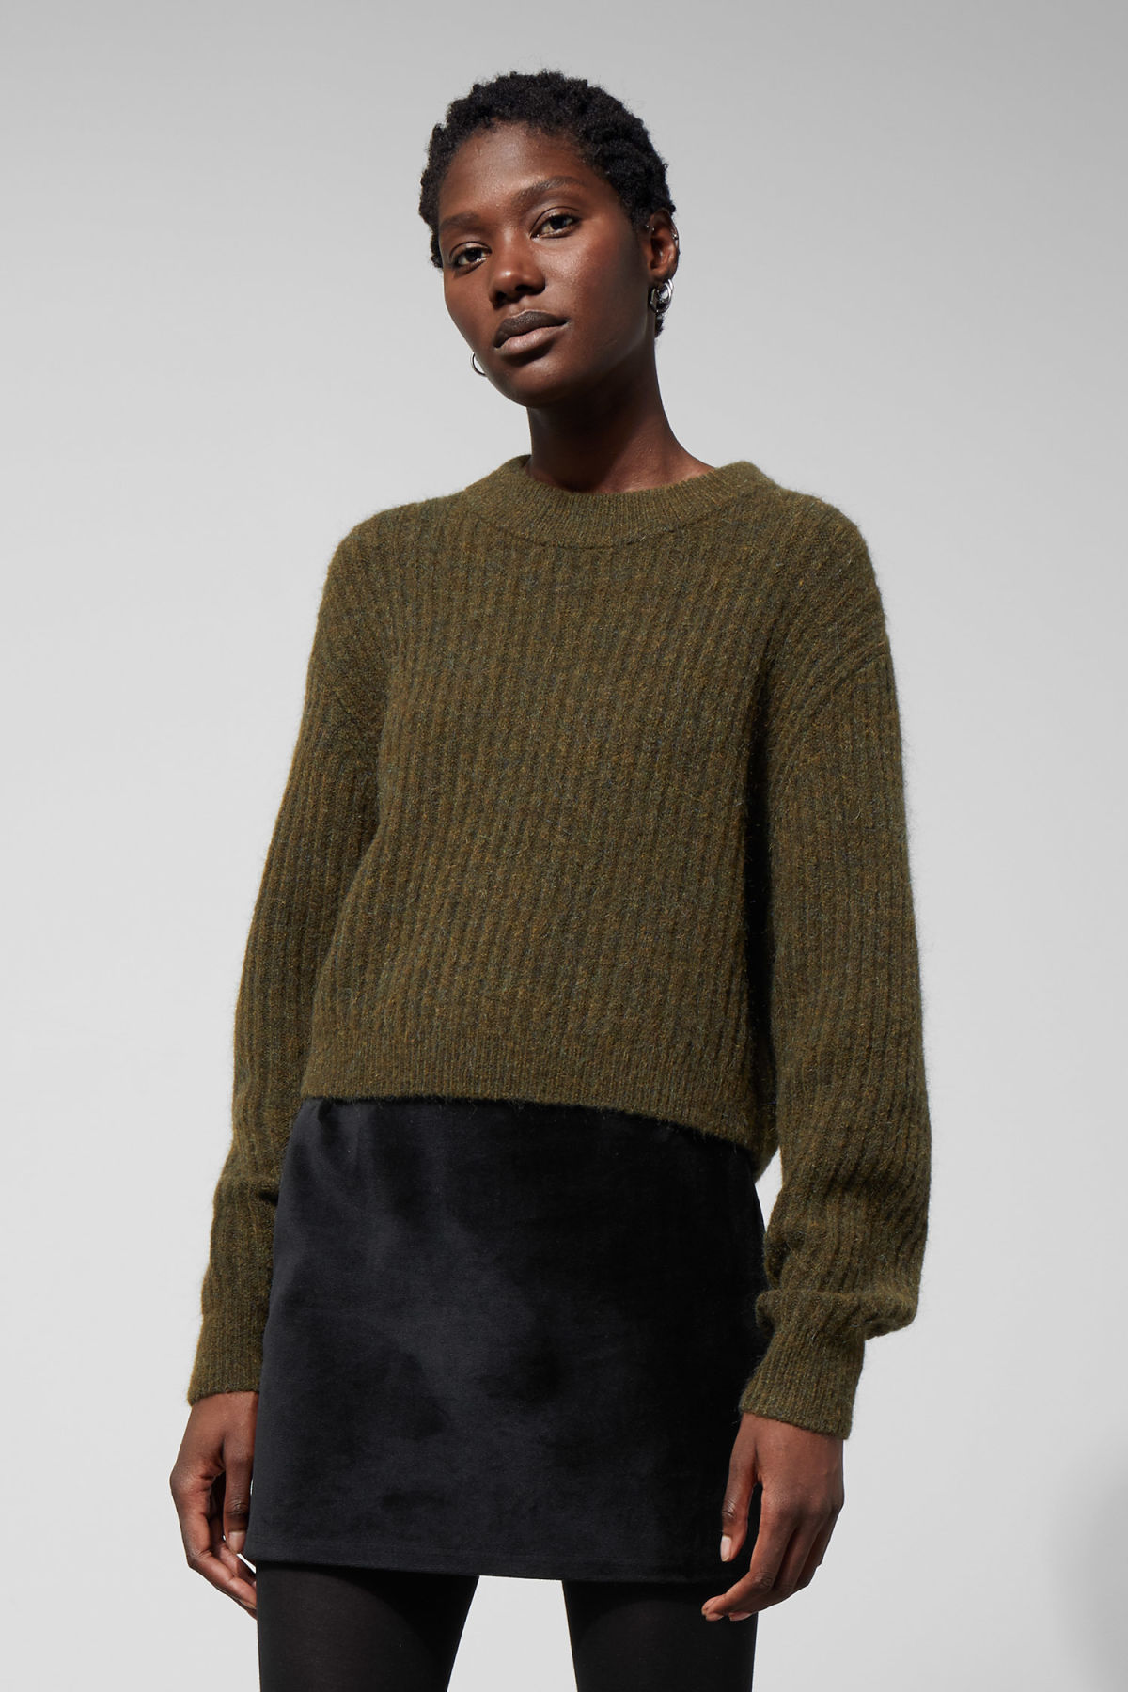 97201dc47cb82f Naya Knit Jumper - Green - Knitwear - Weekday